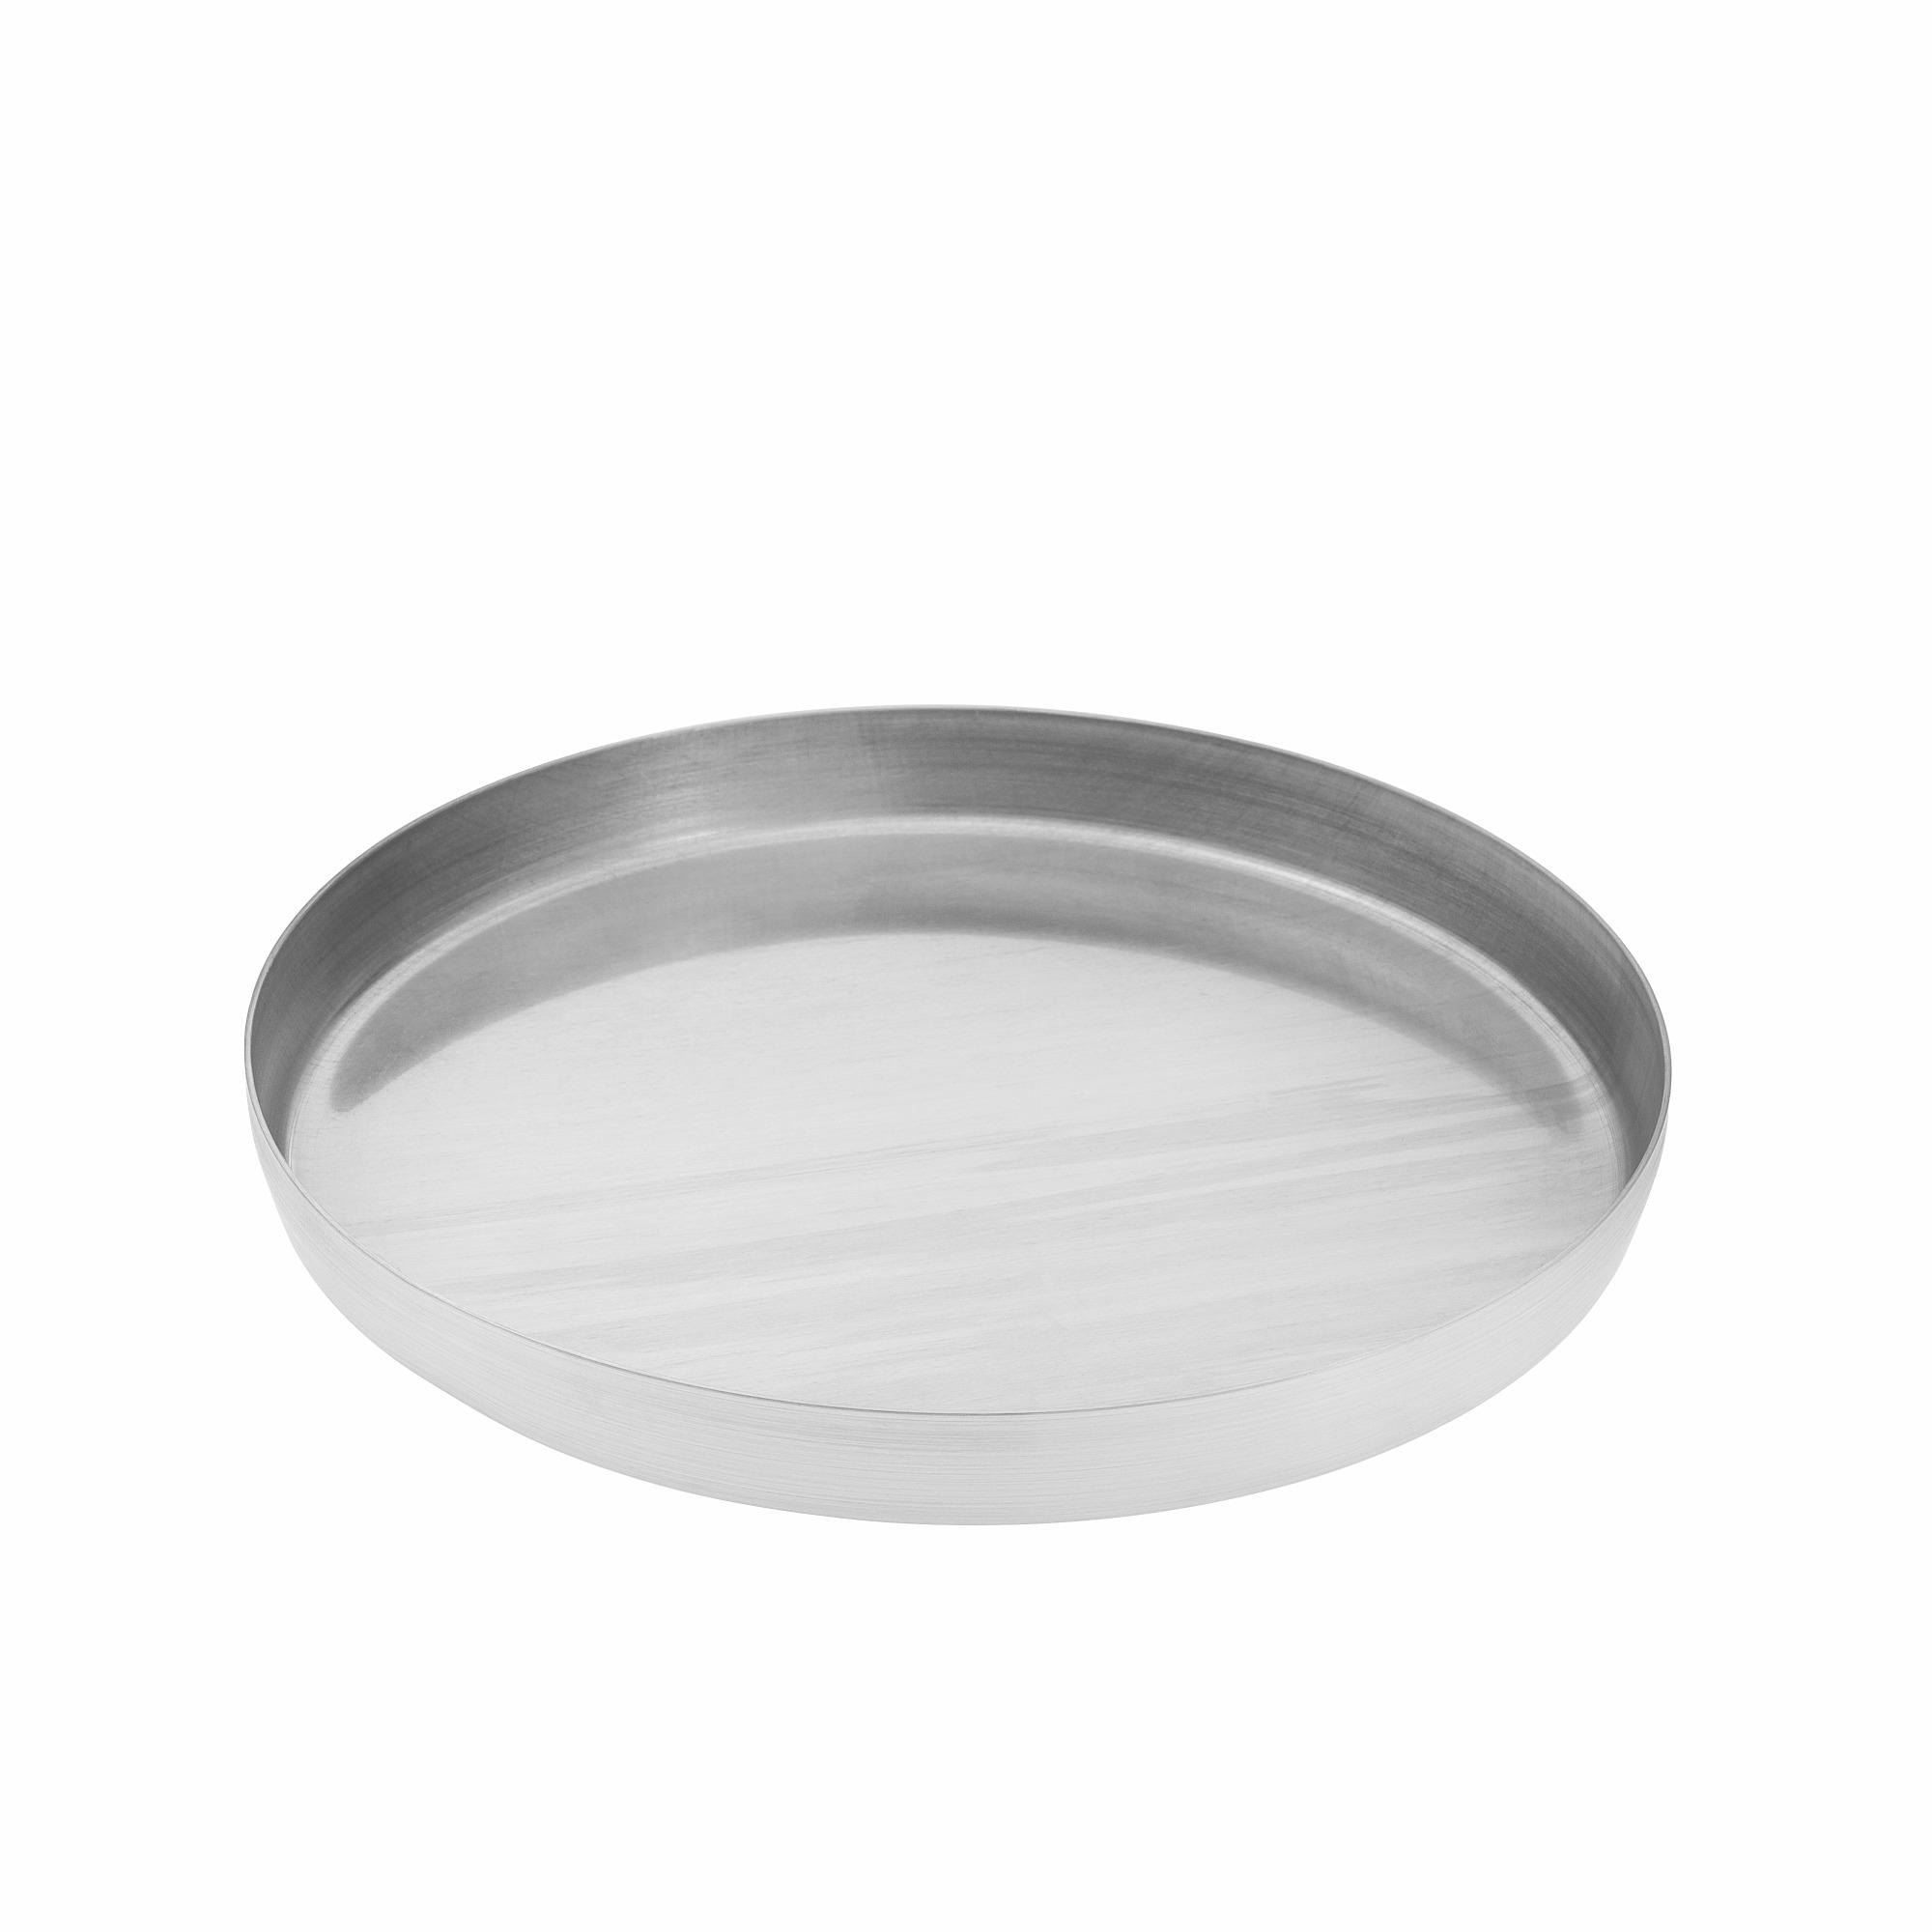 Forma de Aluminio para Pizza Redonda 18 cm - Aluminio Jauli